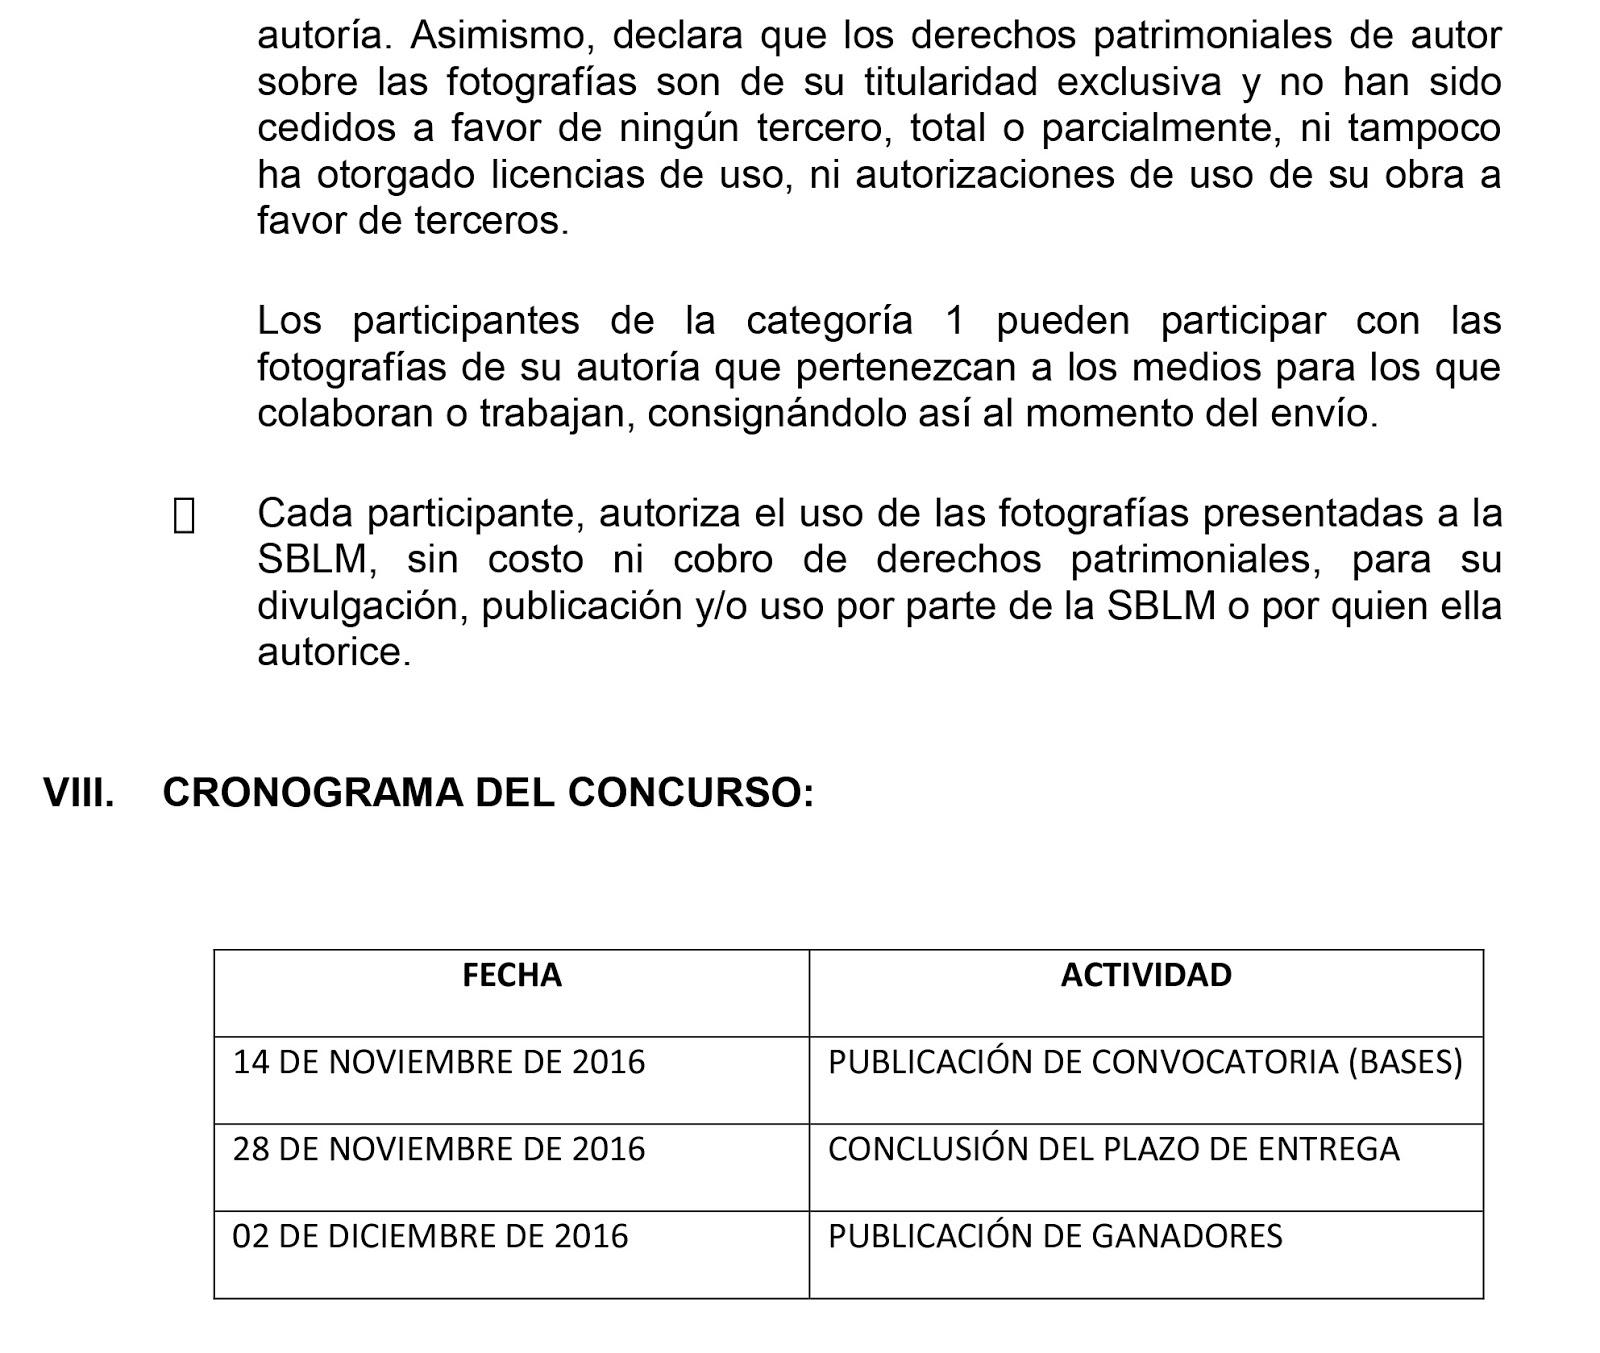 El taurino de lima convocatoria bases concurso de for Convocatoria concurso de docentes 2016